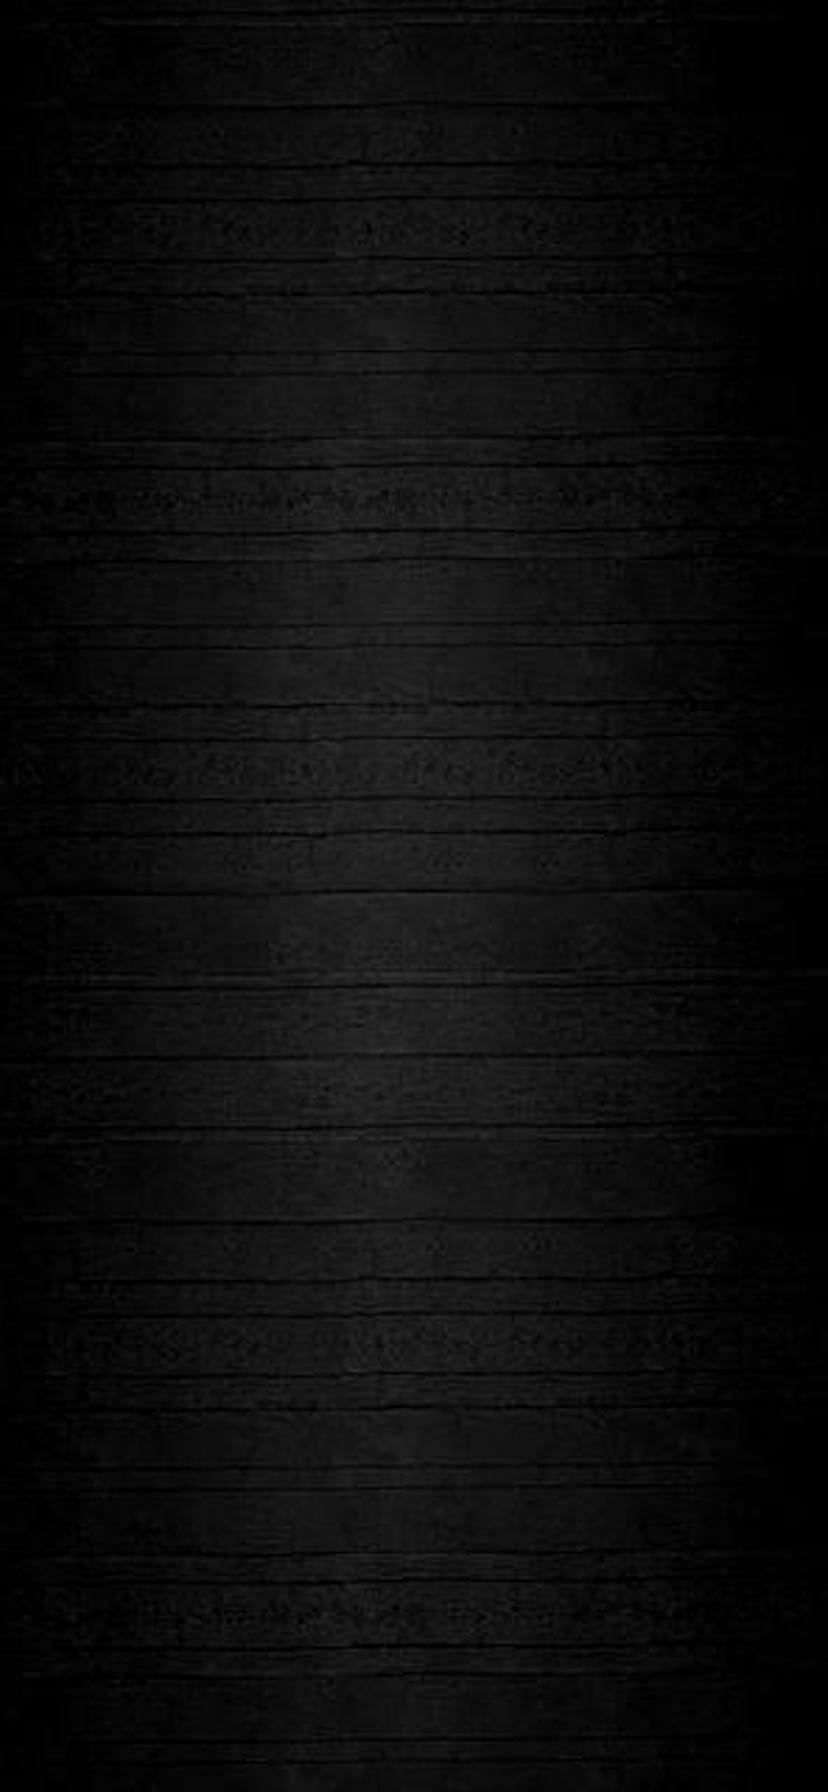 Iphone Xr Black 4k Wallpapers Wallpaper Cave